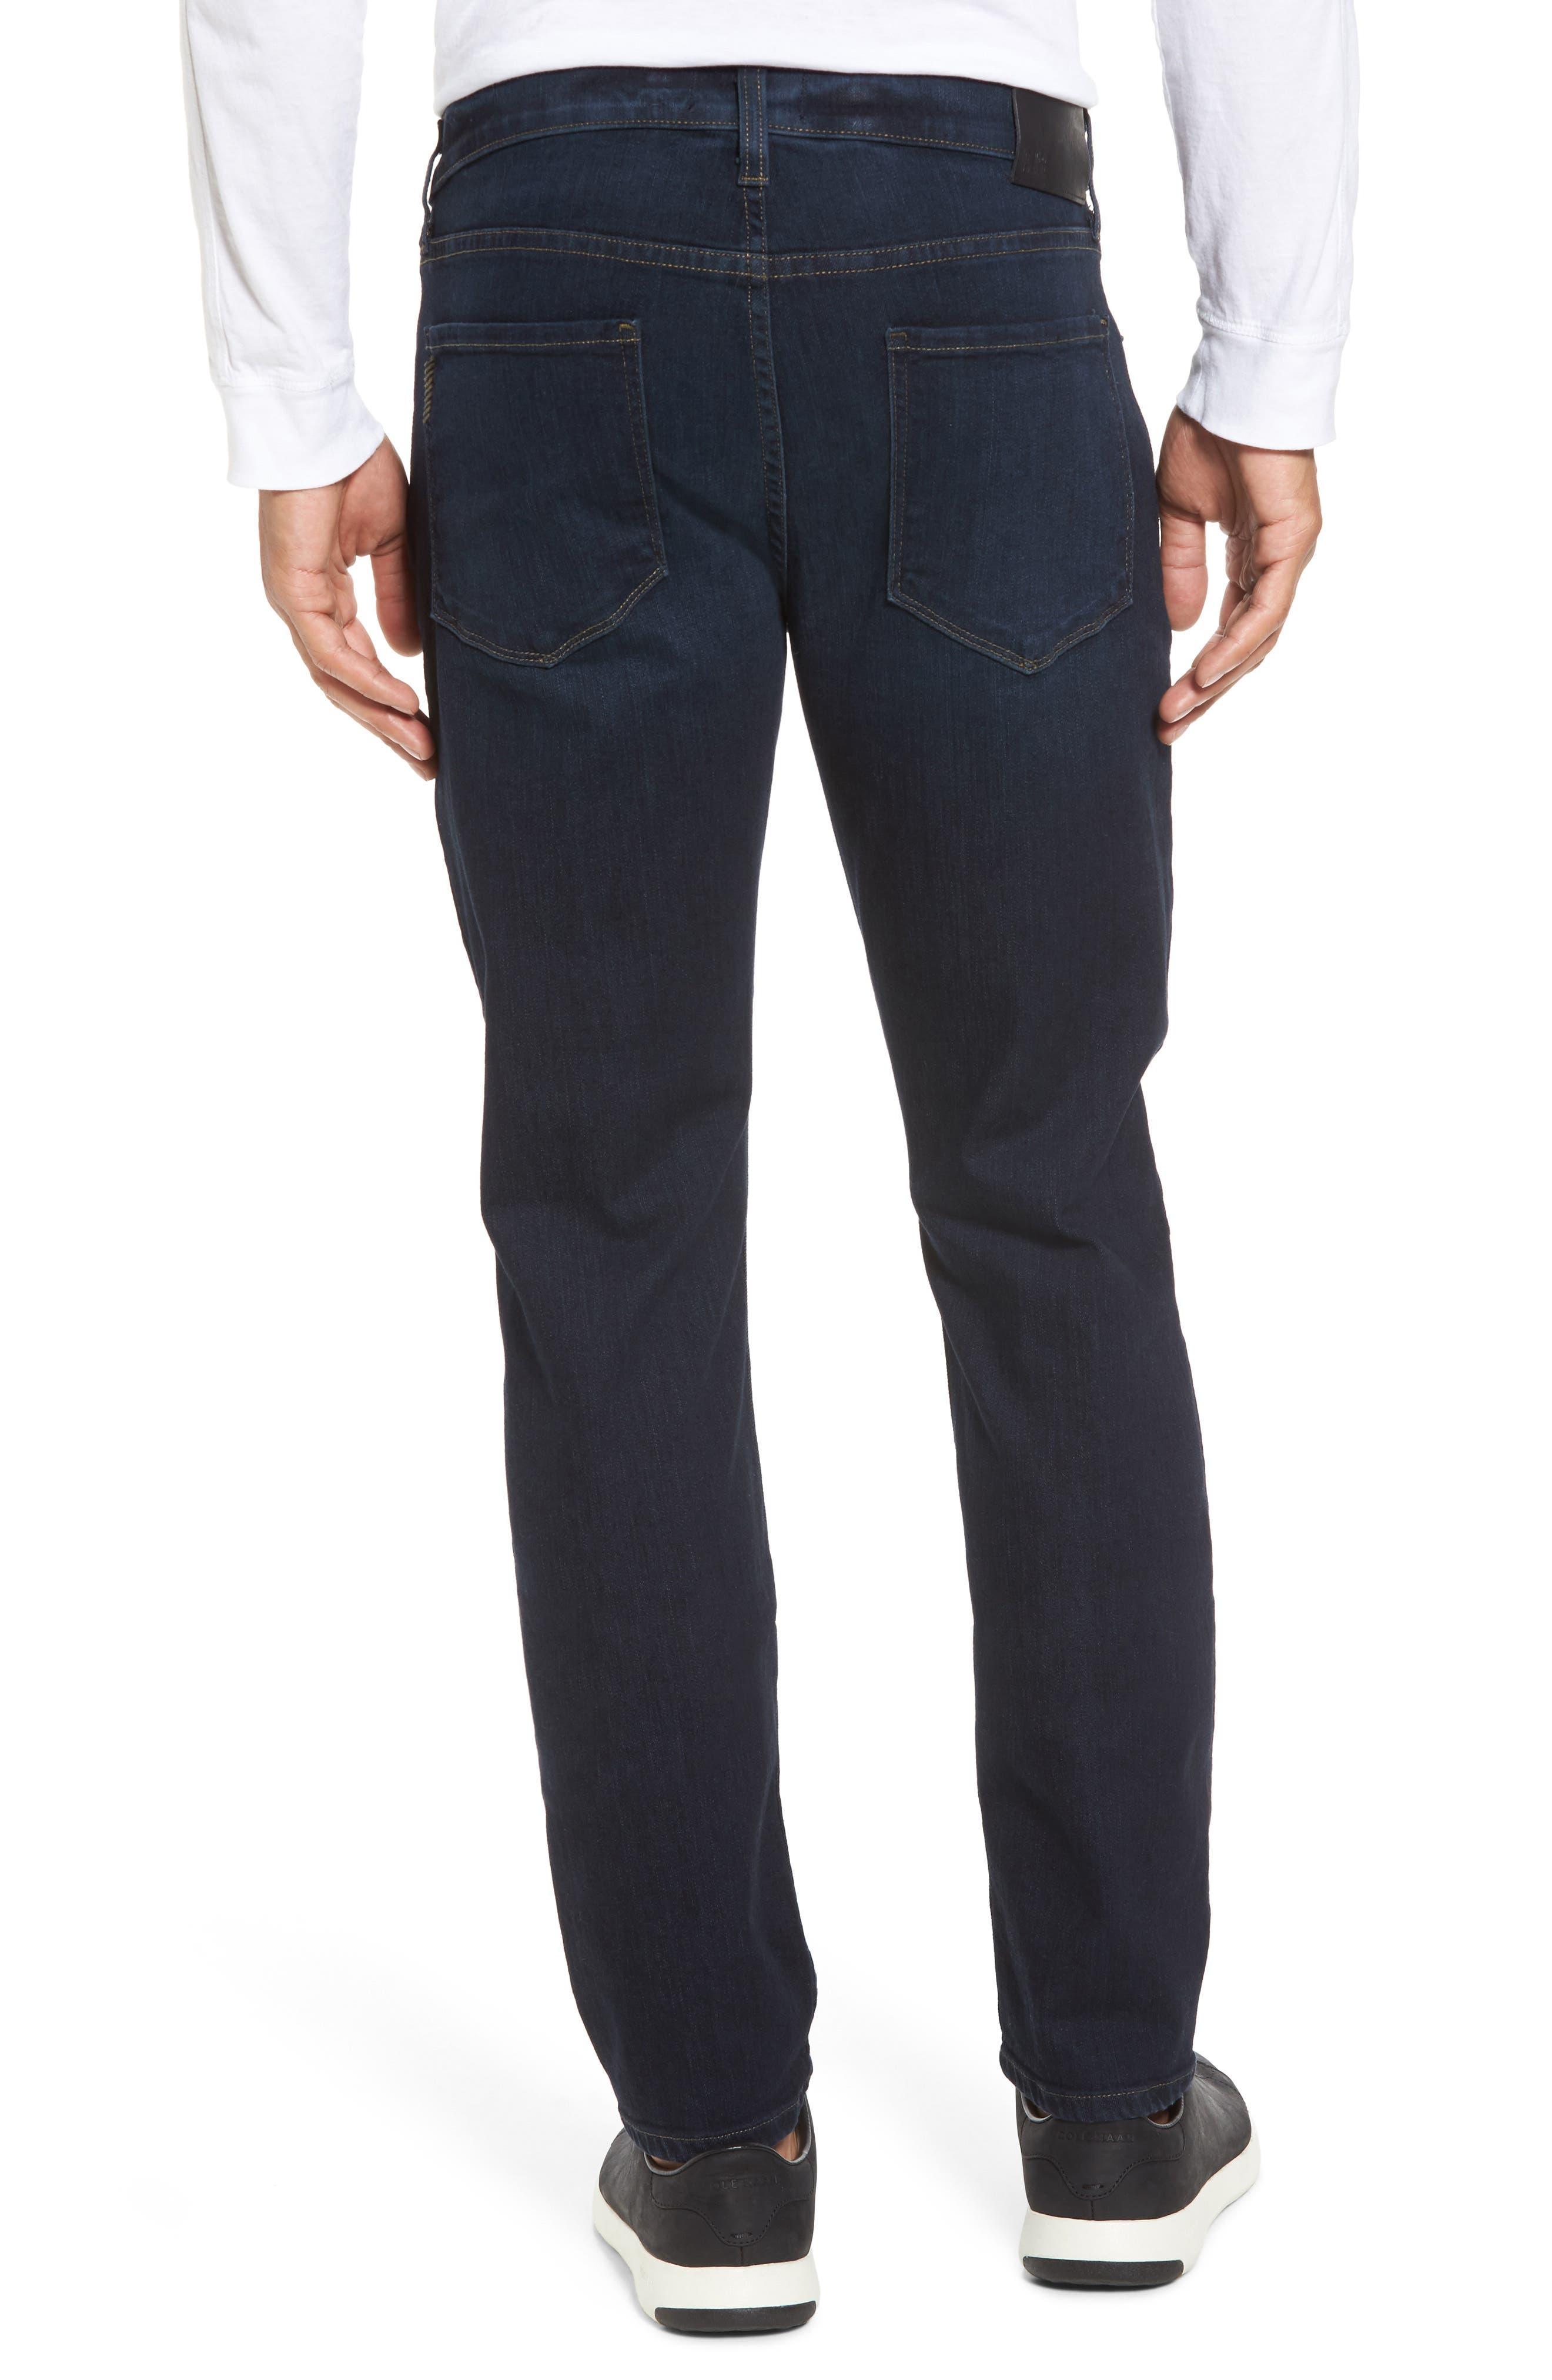 Lennox Slim Fit Jeans,                             Alternate thumbnail 2, color,                             Jonathan